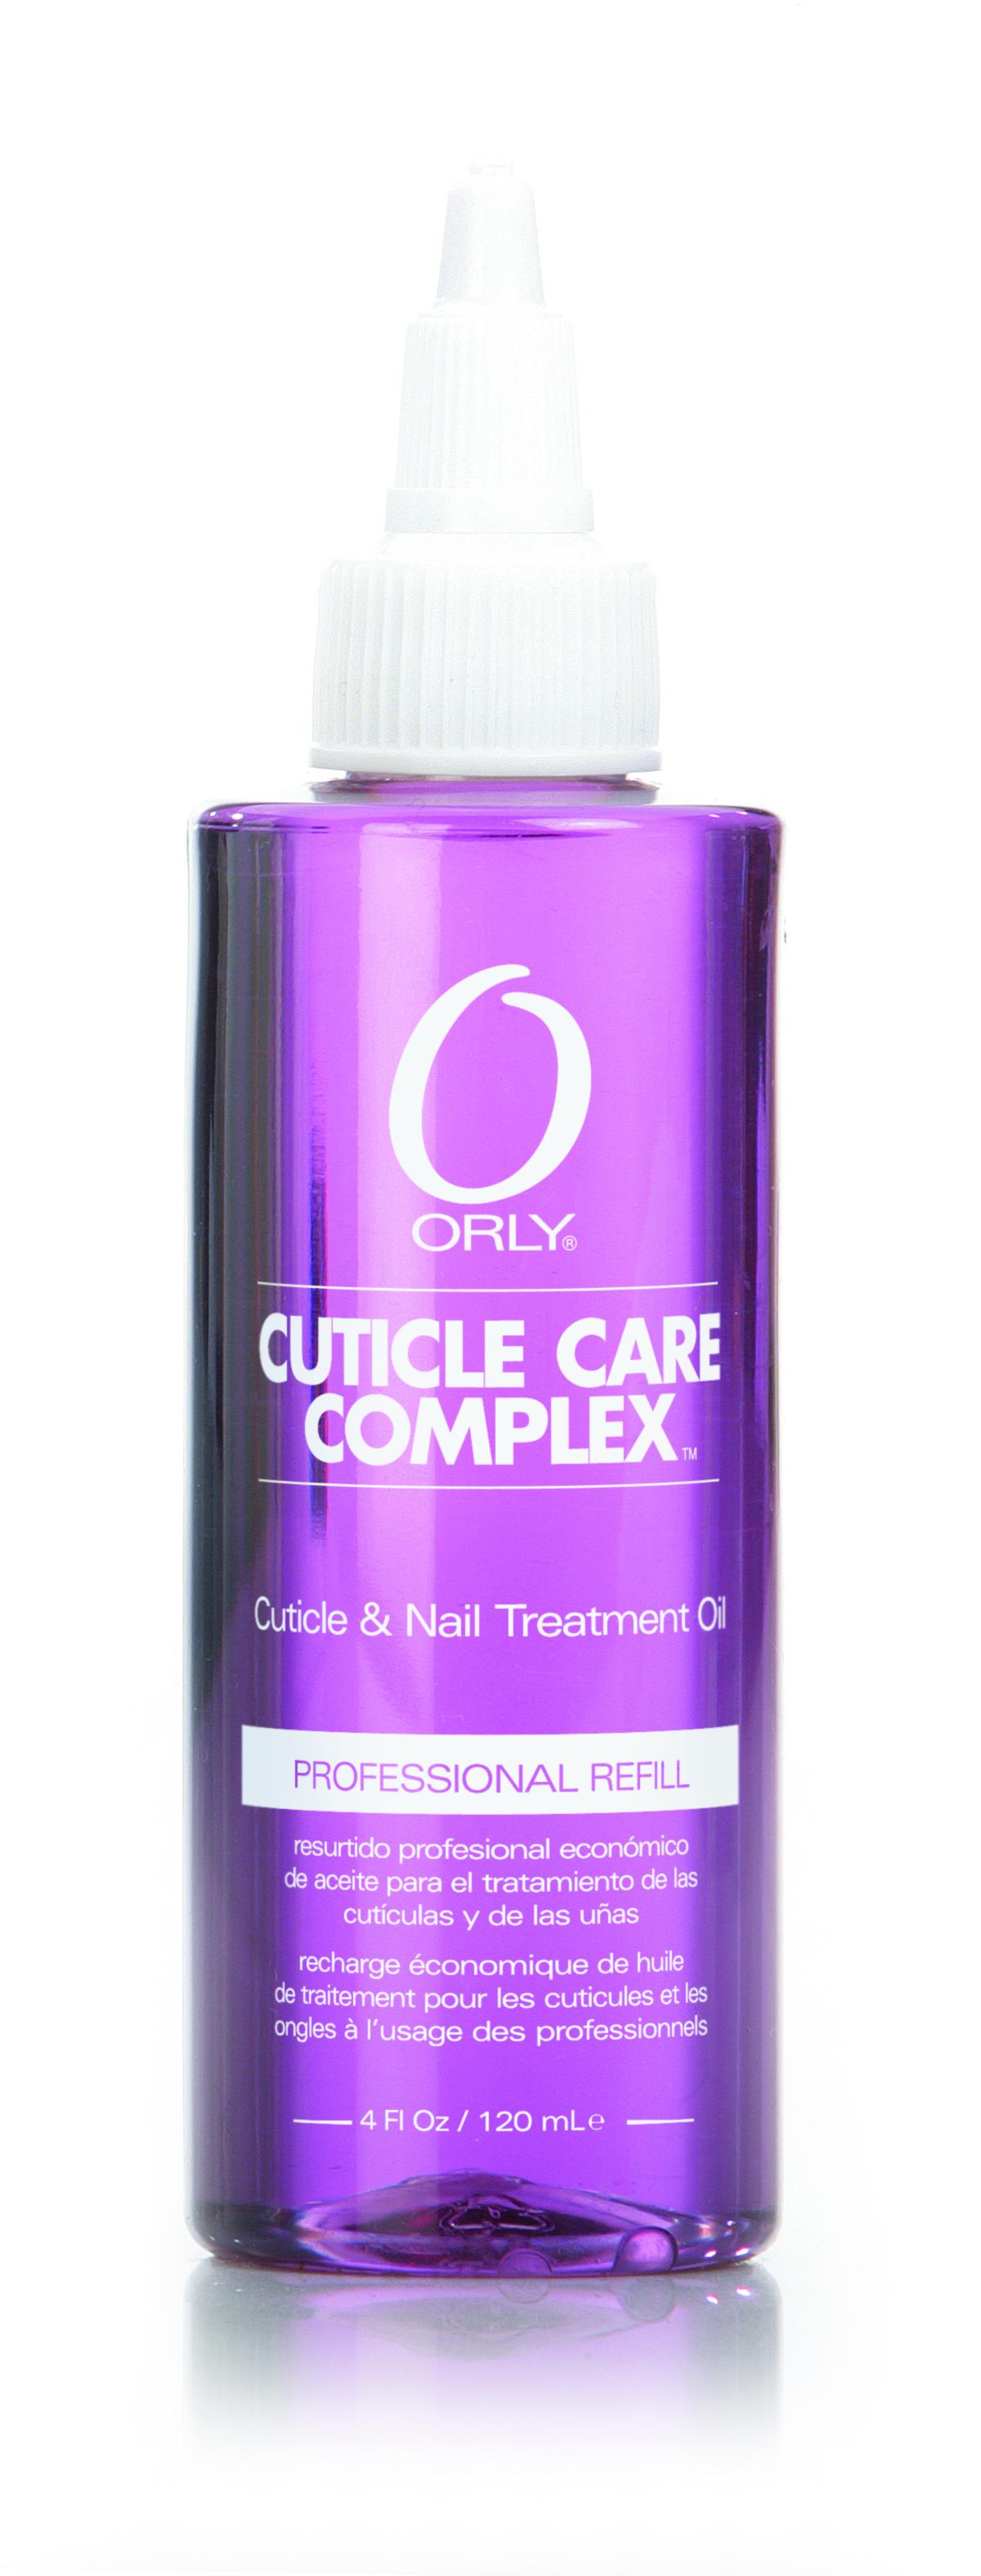 ORLY Масло по уходу за кутикулой / Cuticle Care Complex 120мл